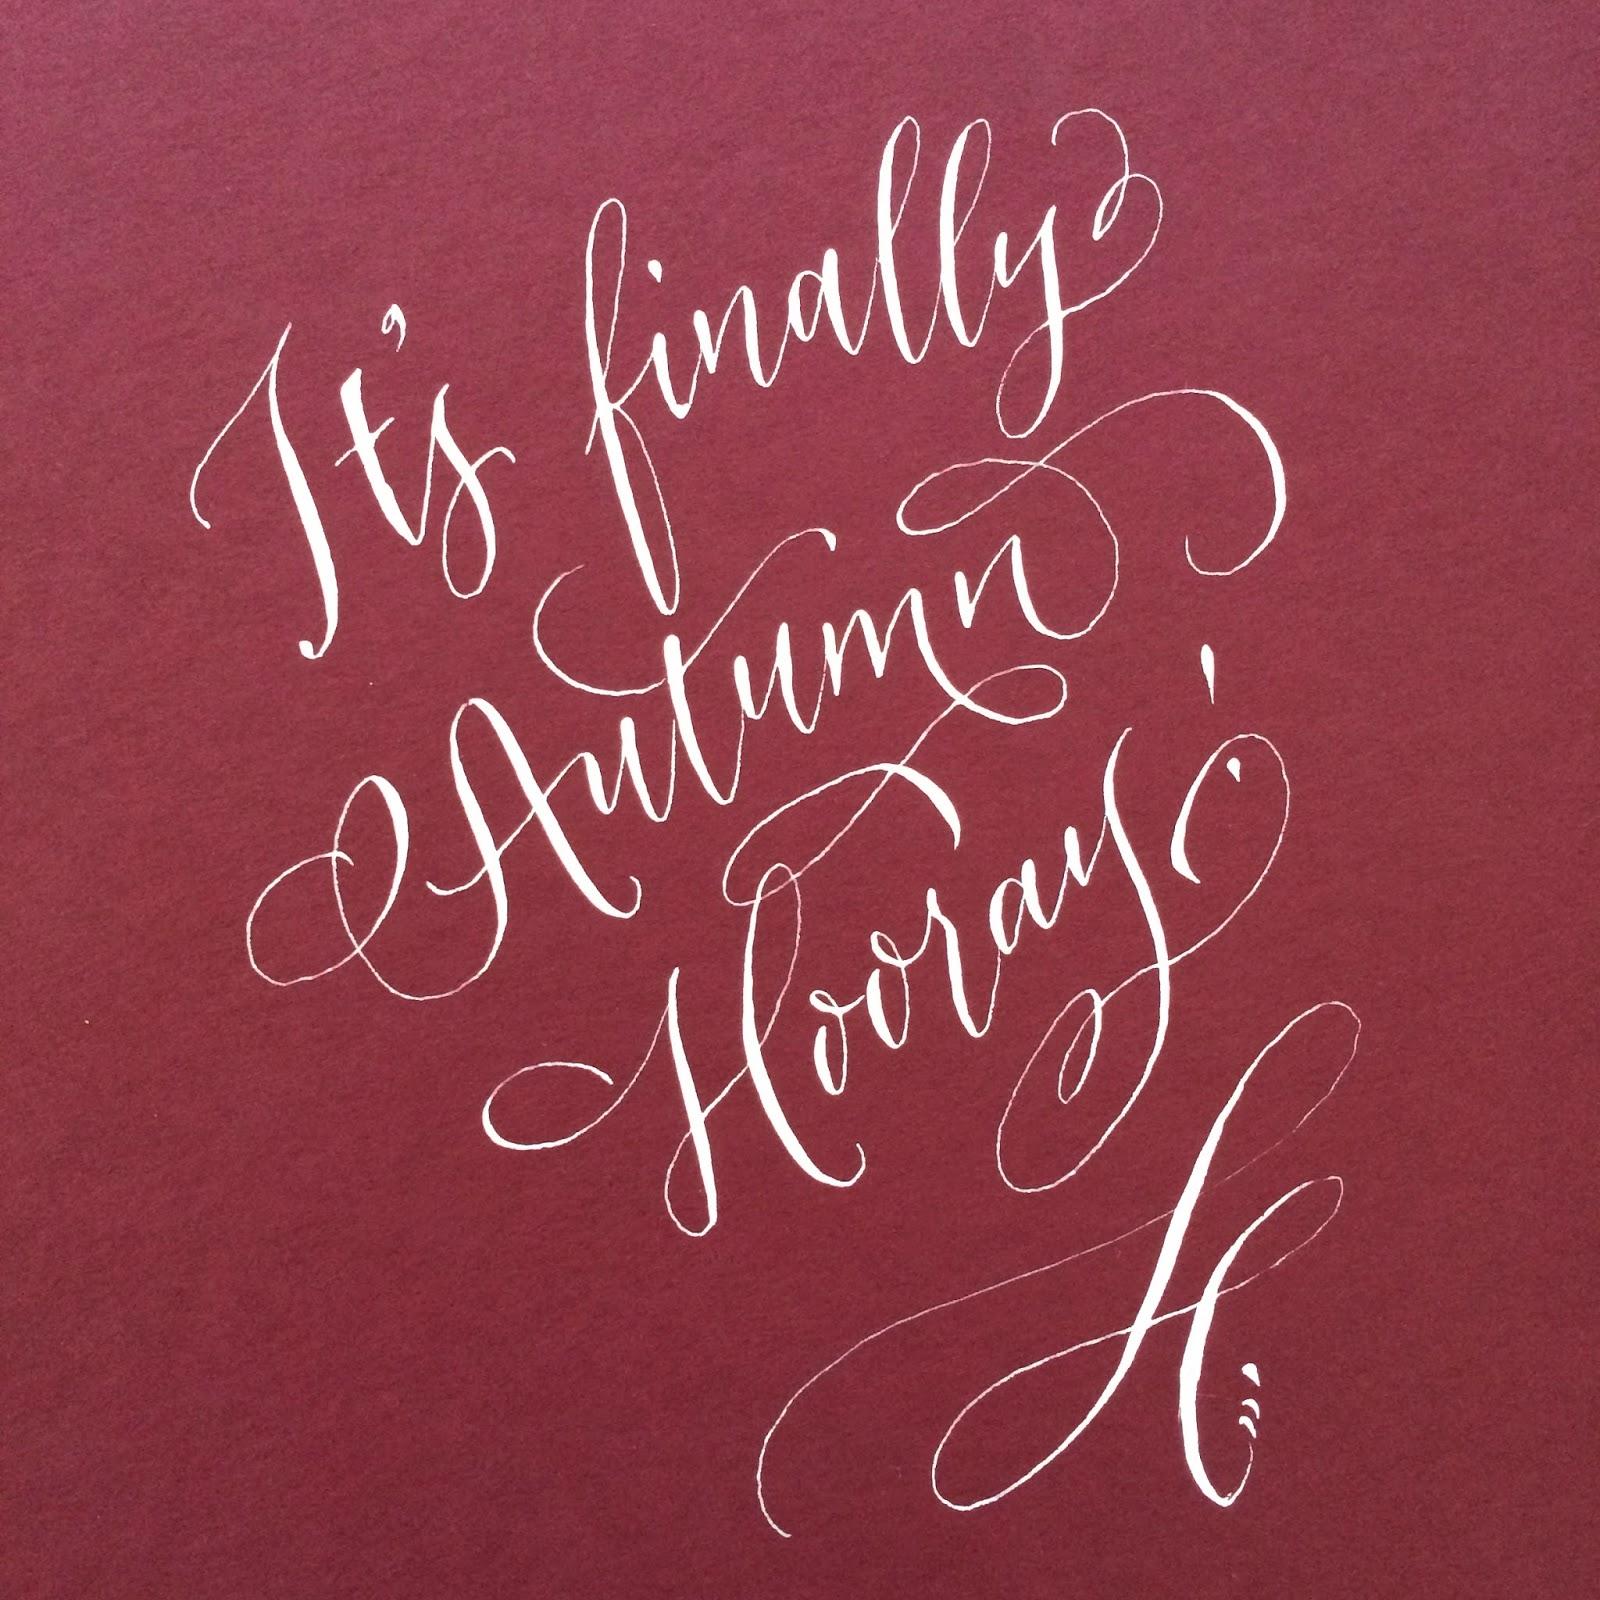 Antiquaria Calligraphy In Action It 39 S Autumn